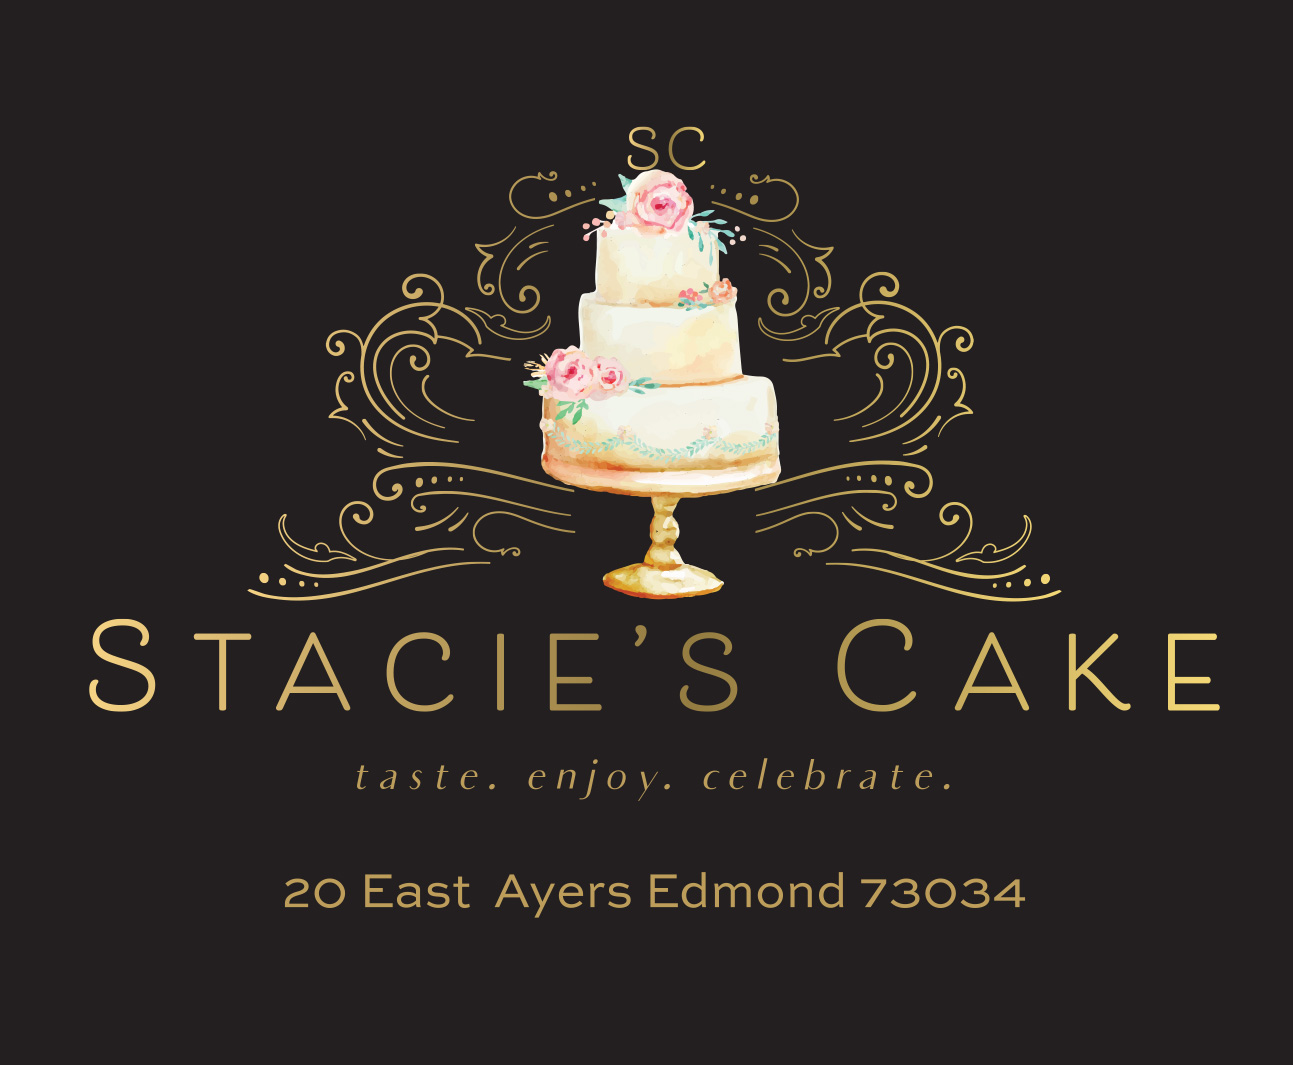 Stacie's Cakes Cakes & Desserts